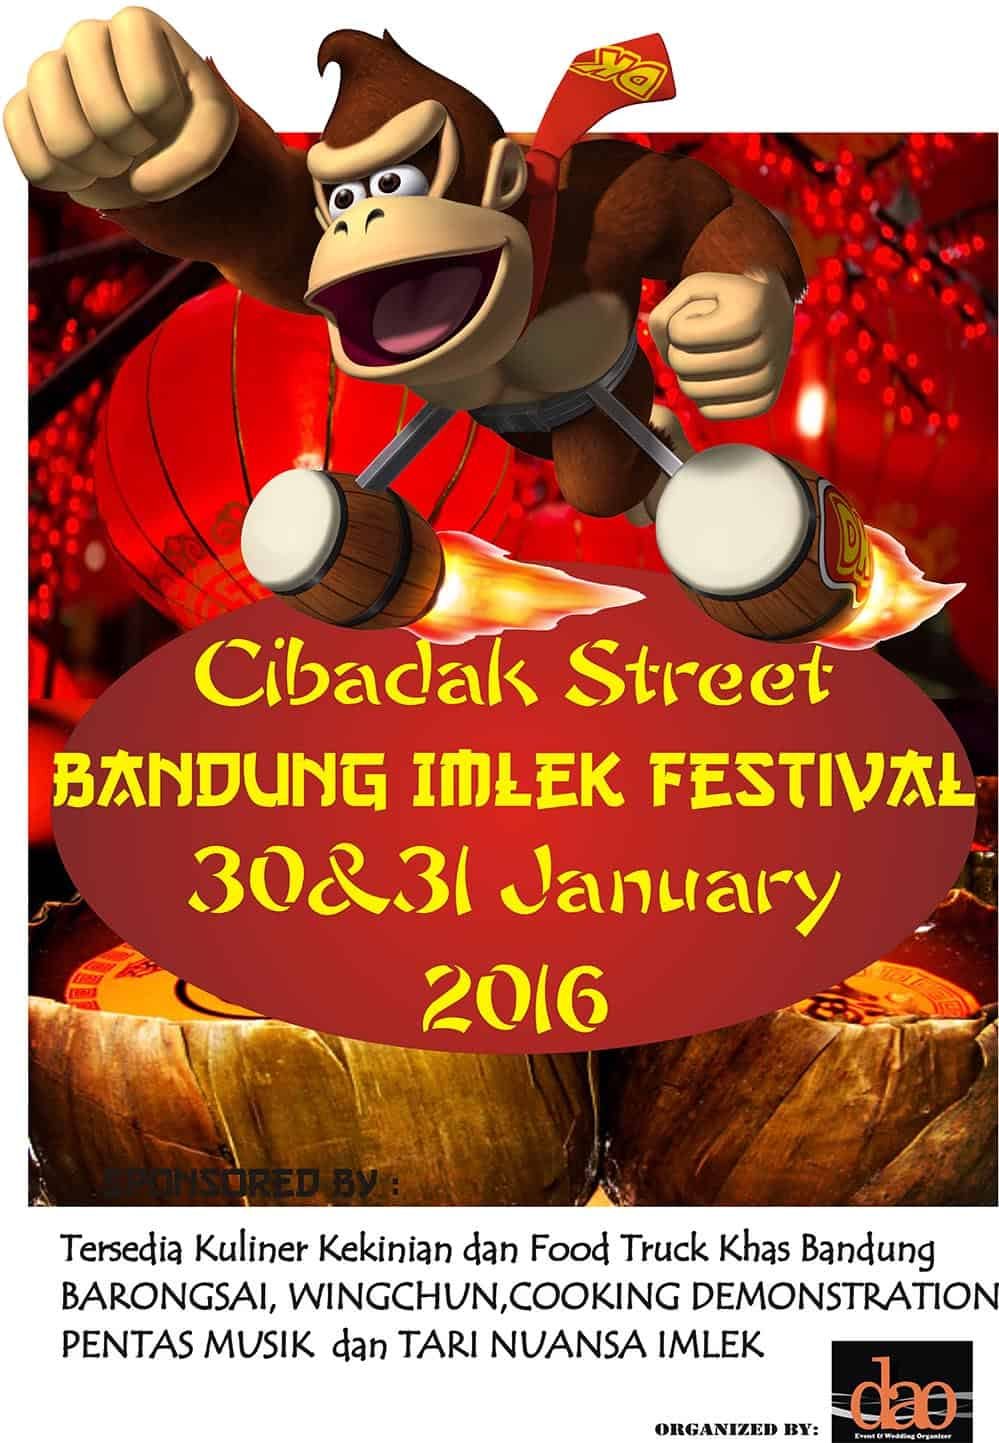 Cibadak Street Bandung Imlek Festival 2016